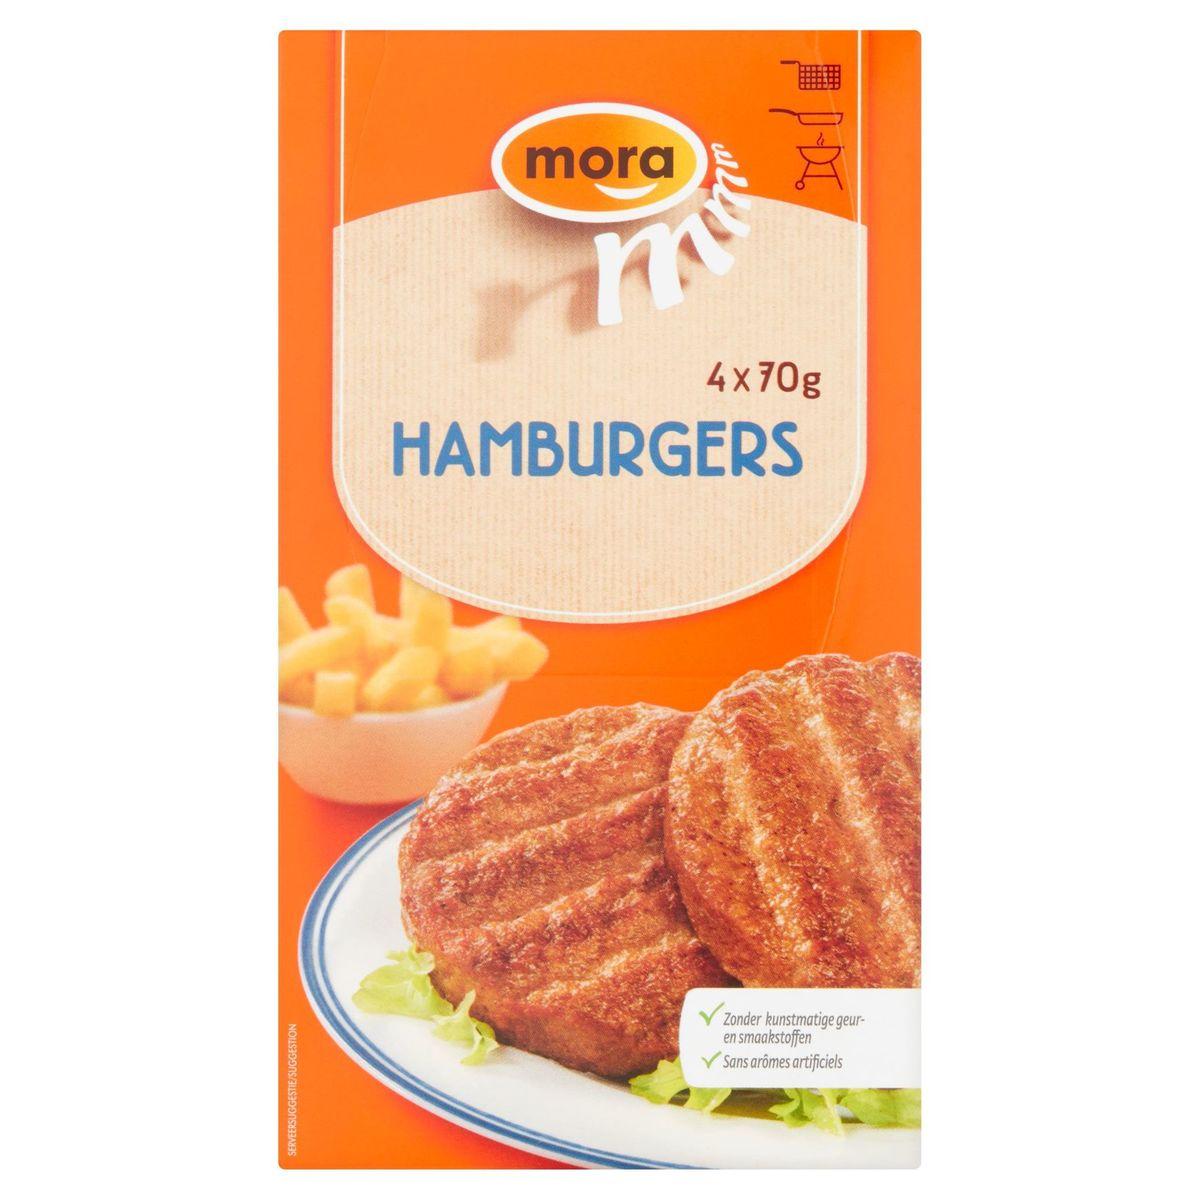 Mora Hamburgers 4 x 70 g